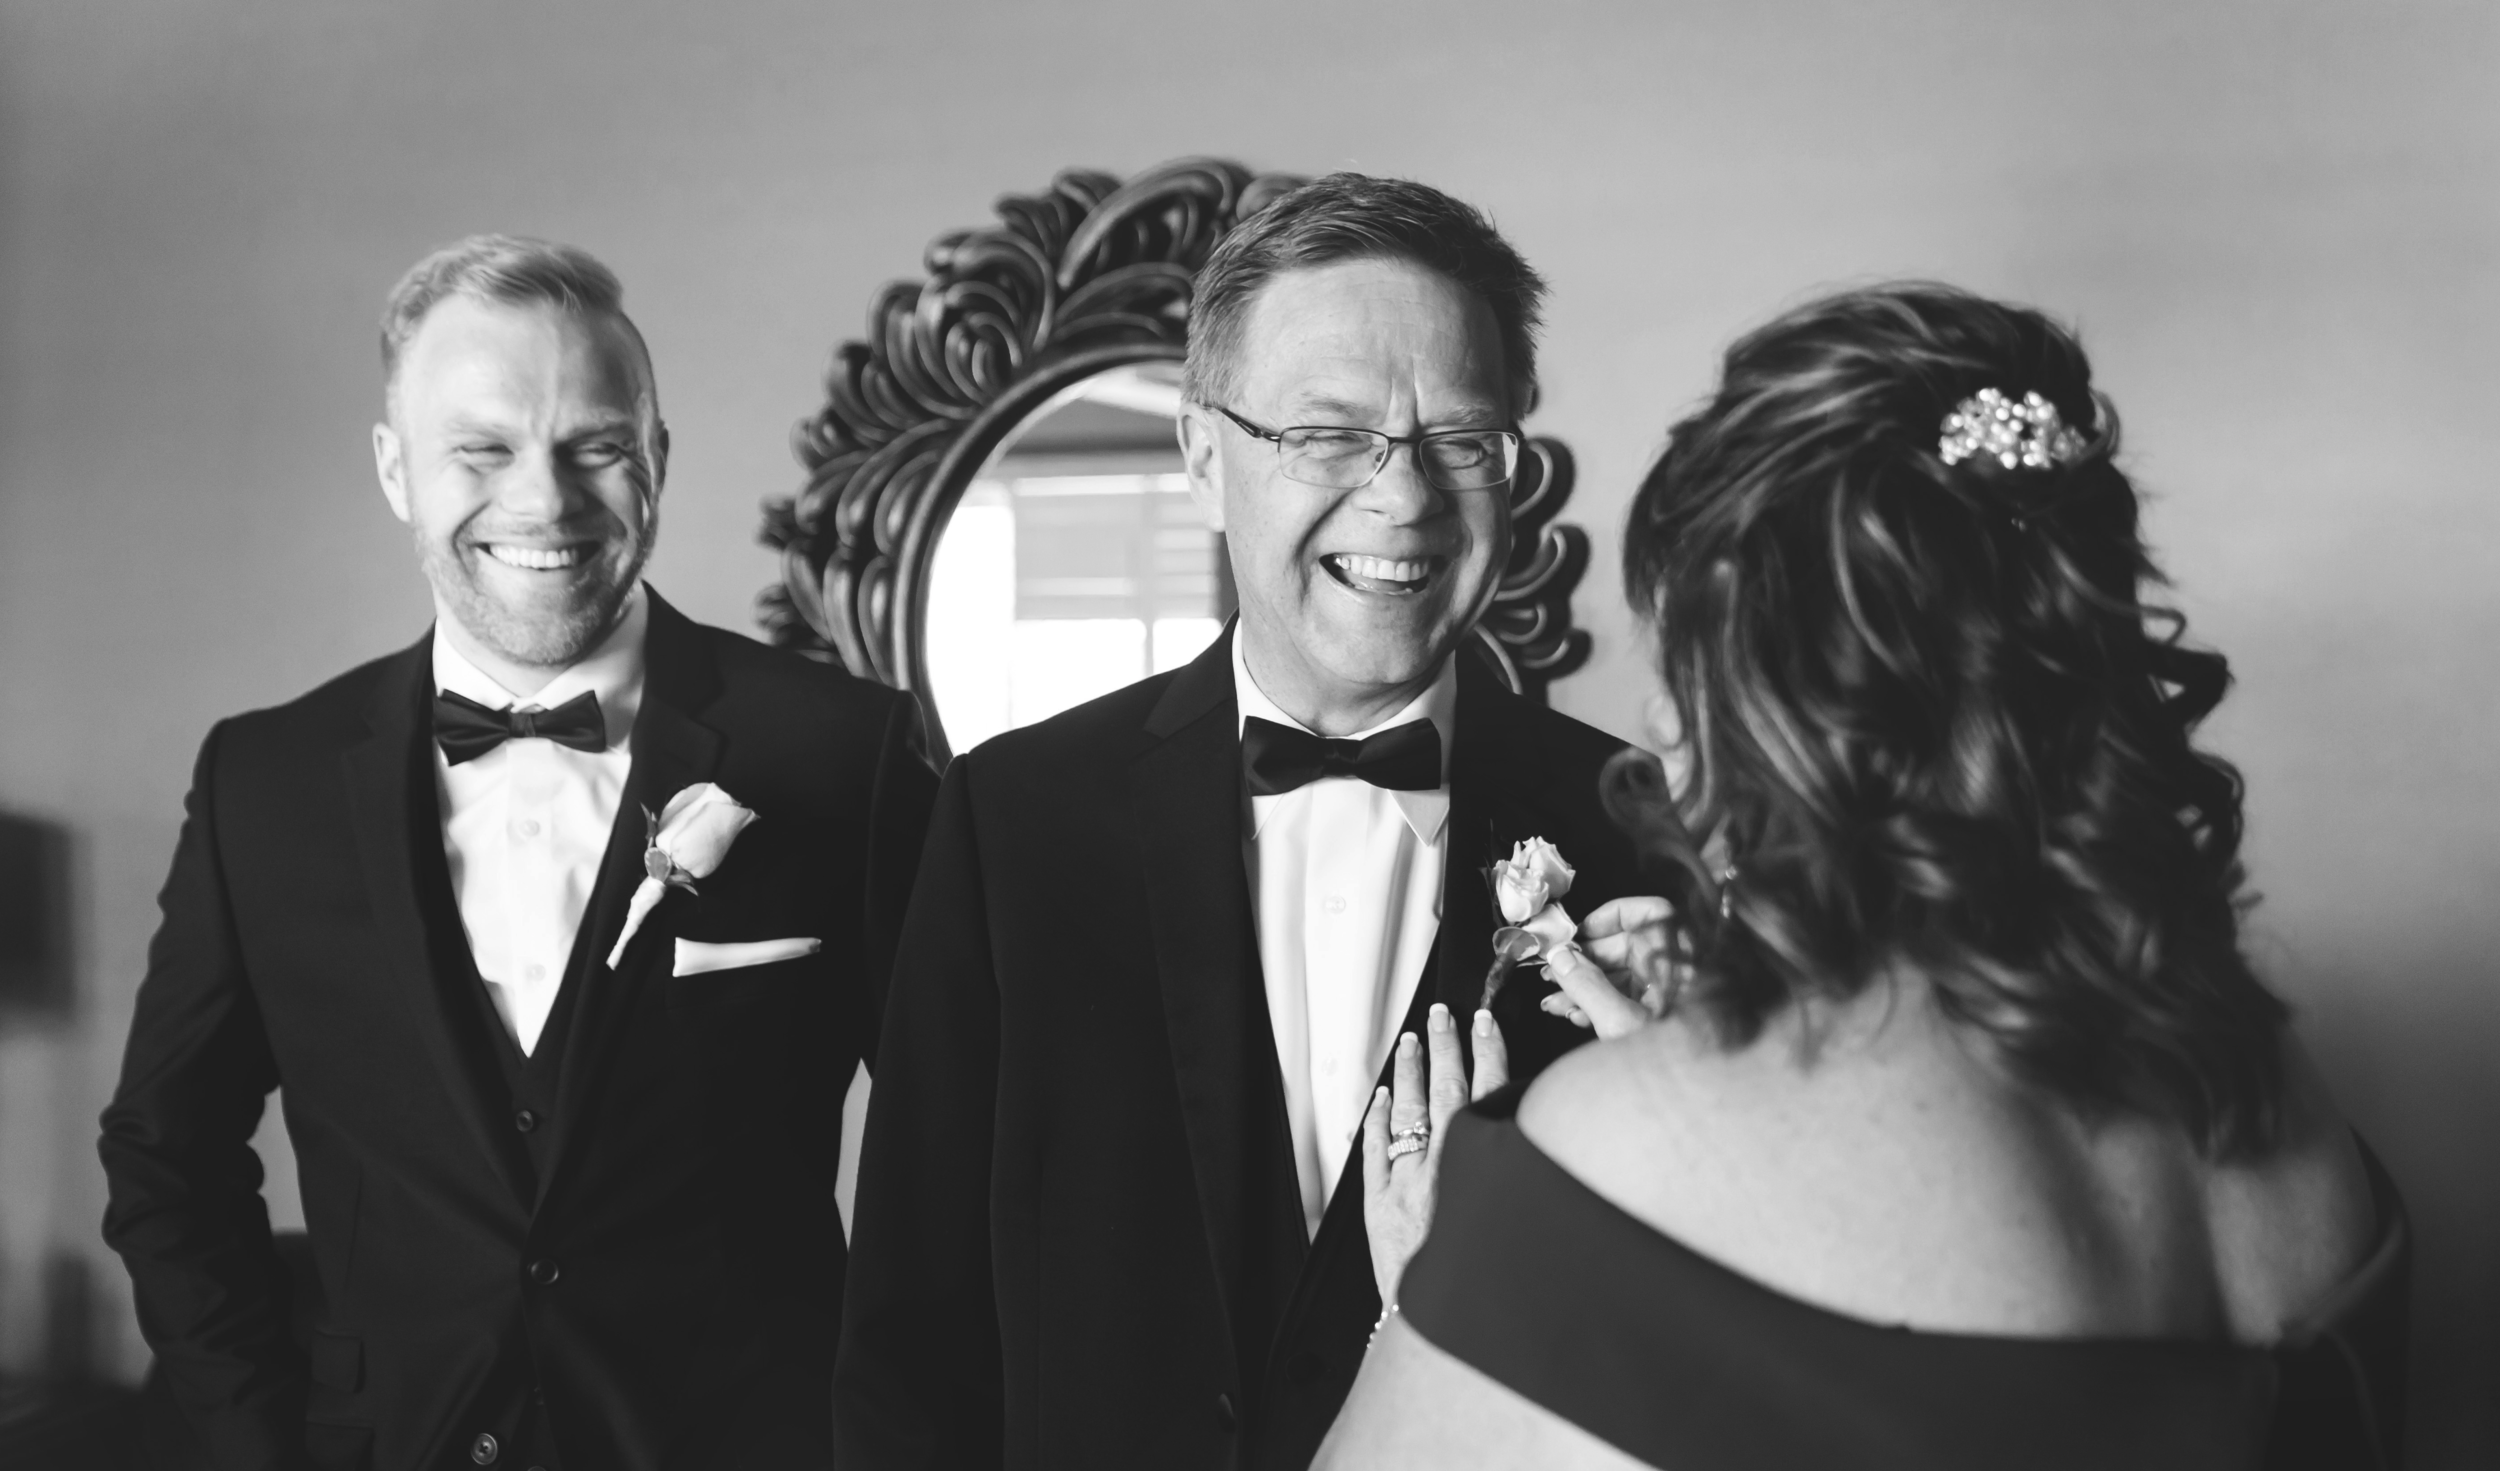 Wedding-Harbour-Banquet-Center-Oakville-Photographer-Wedding-Hamilton-Saint-James-Espresso-Downtown-HamOnt-GTA-Niagara-Toronto-Moments-by-Lauren-Photography-Photo-Image-9.png